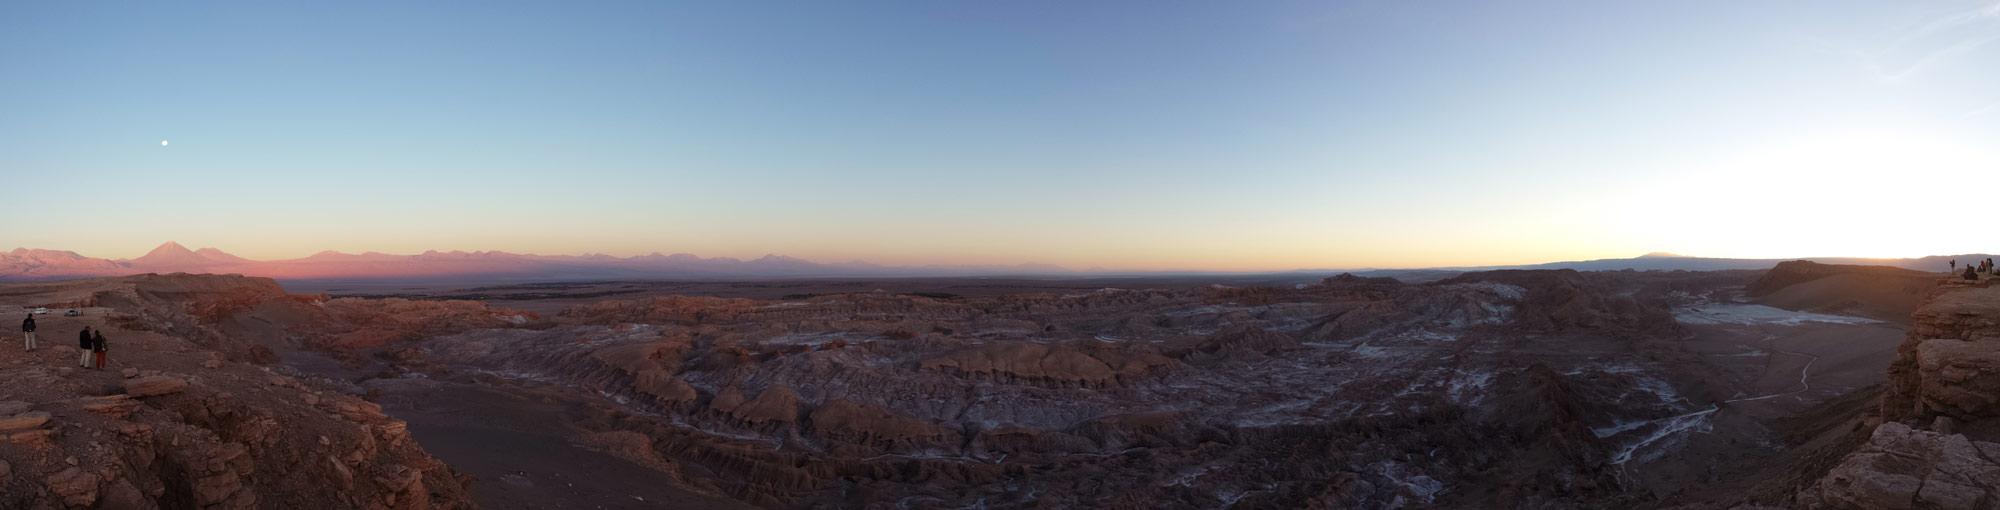 Panorama of sunset at Valle de la Luna